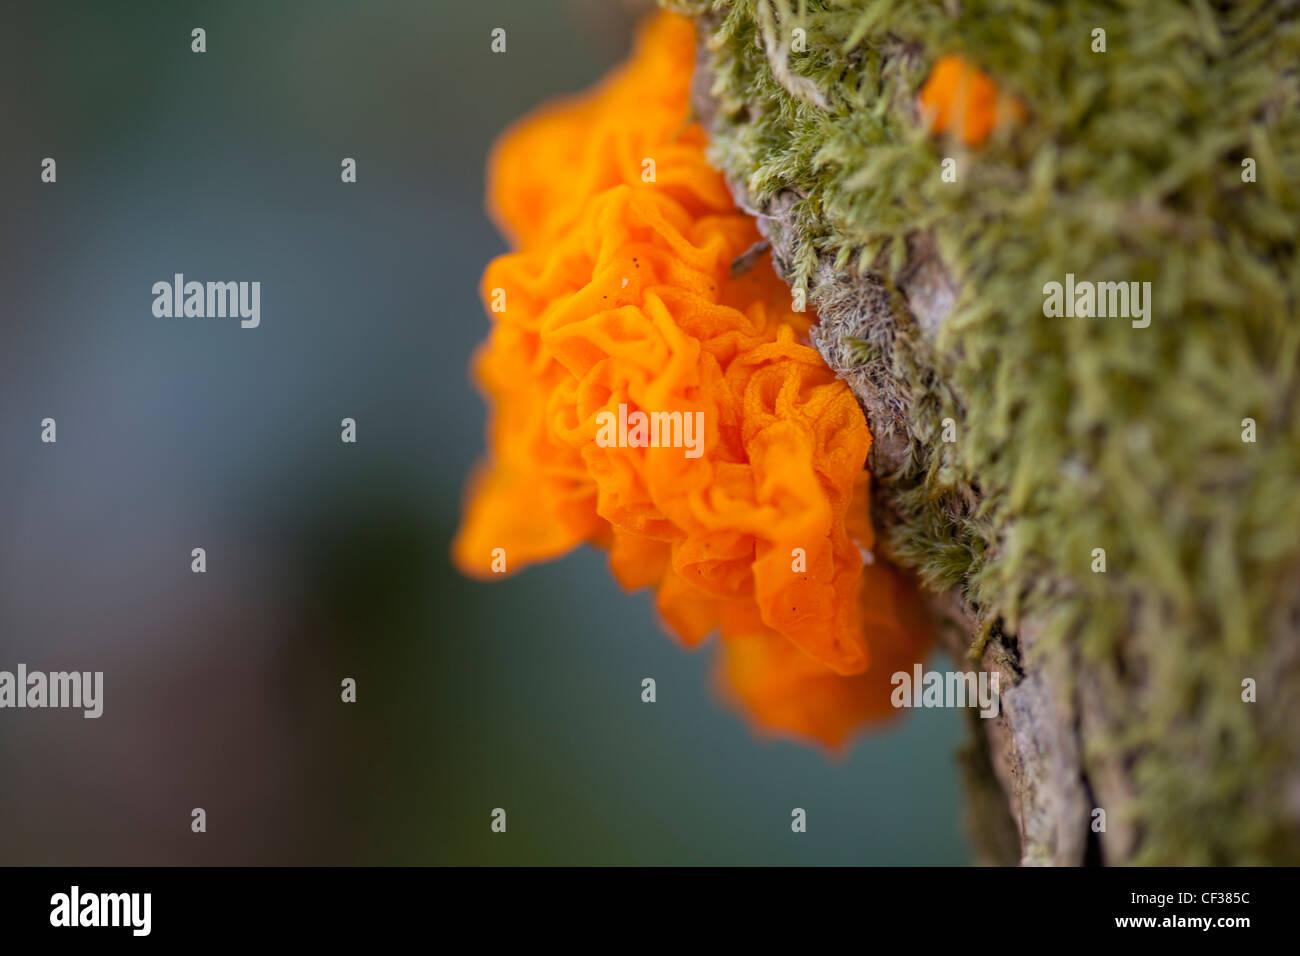 Orange Jelly Fungus (Tremella mesenterica), growing on dead Gorse branch, shaped like a human head in profile. - Stock Image